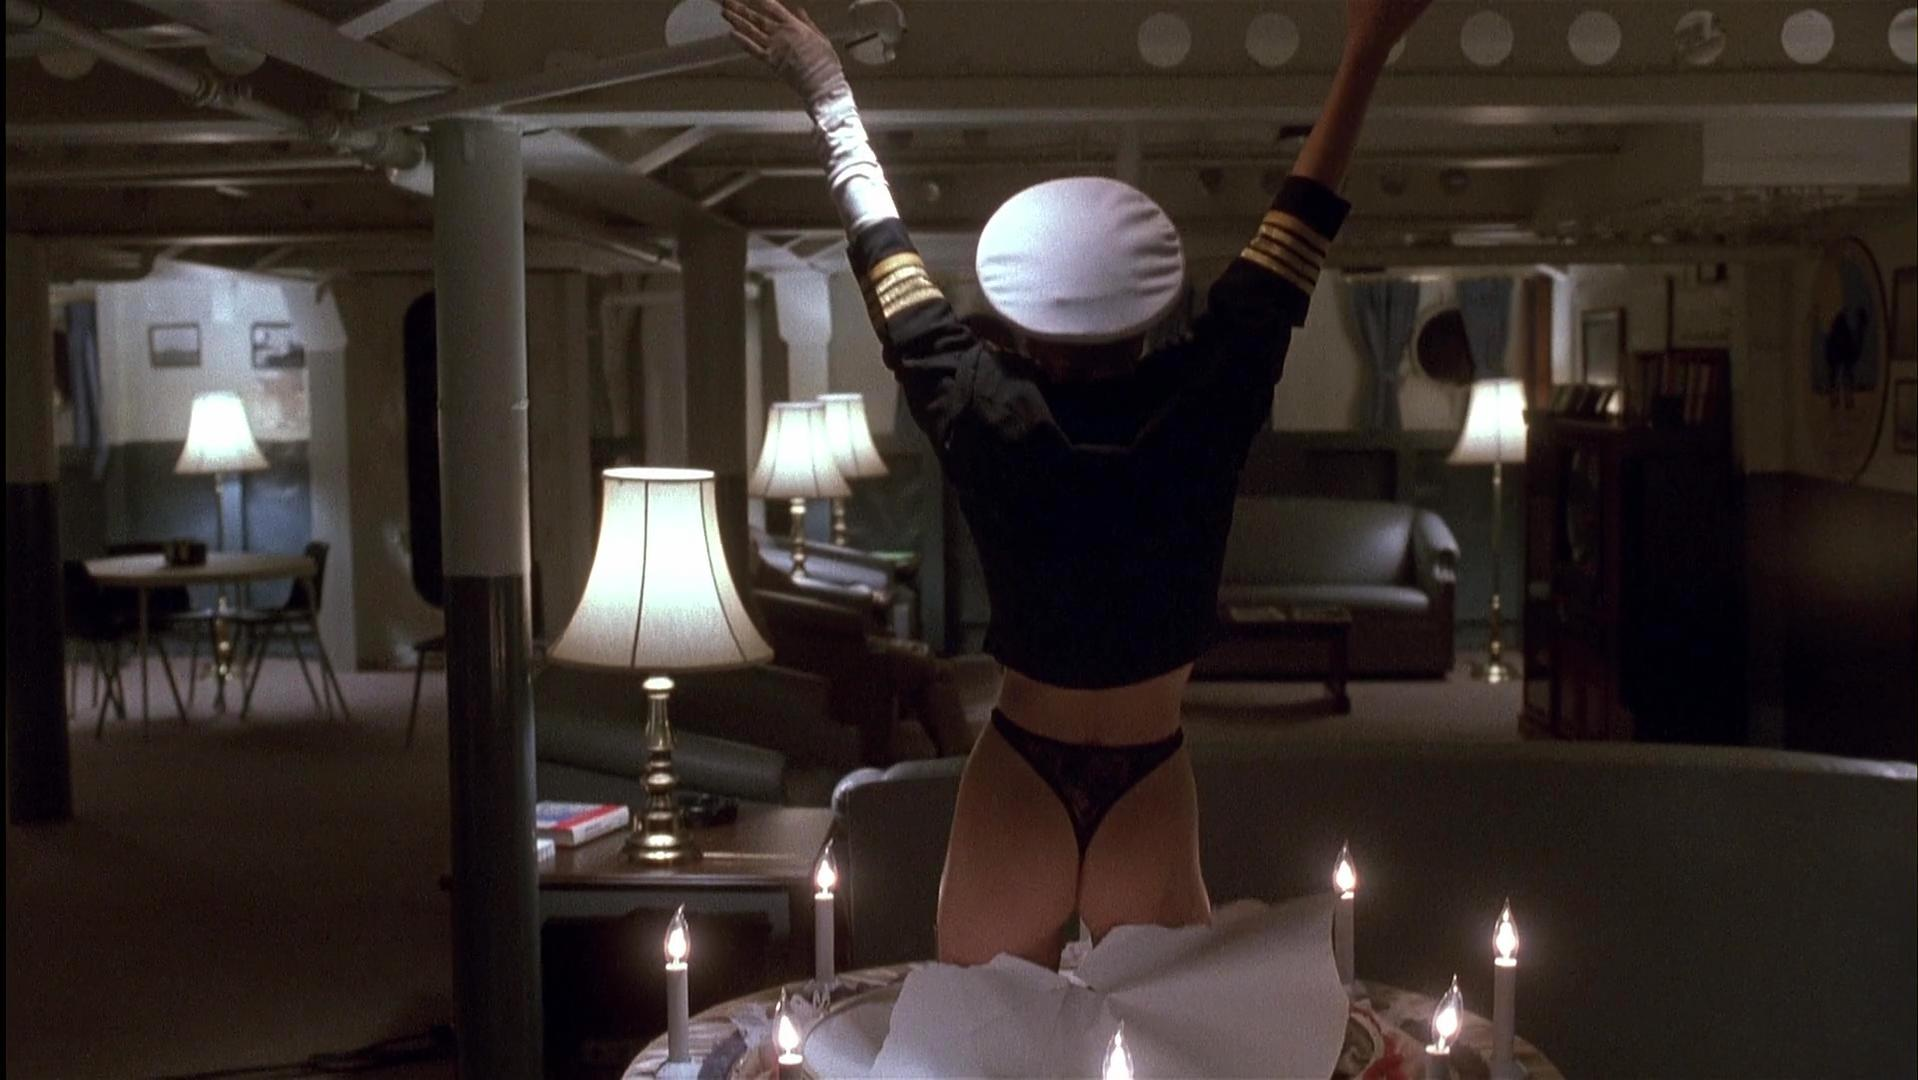 kris kristopherson movie sex scene